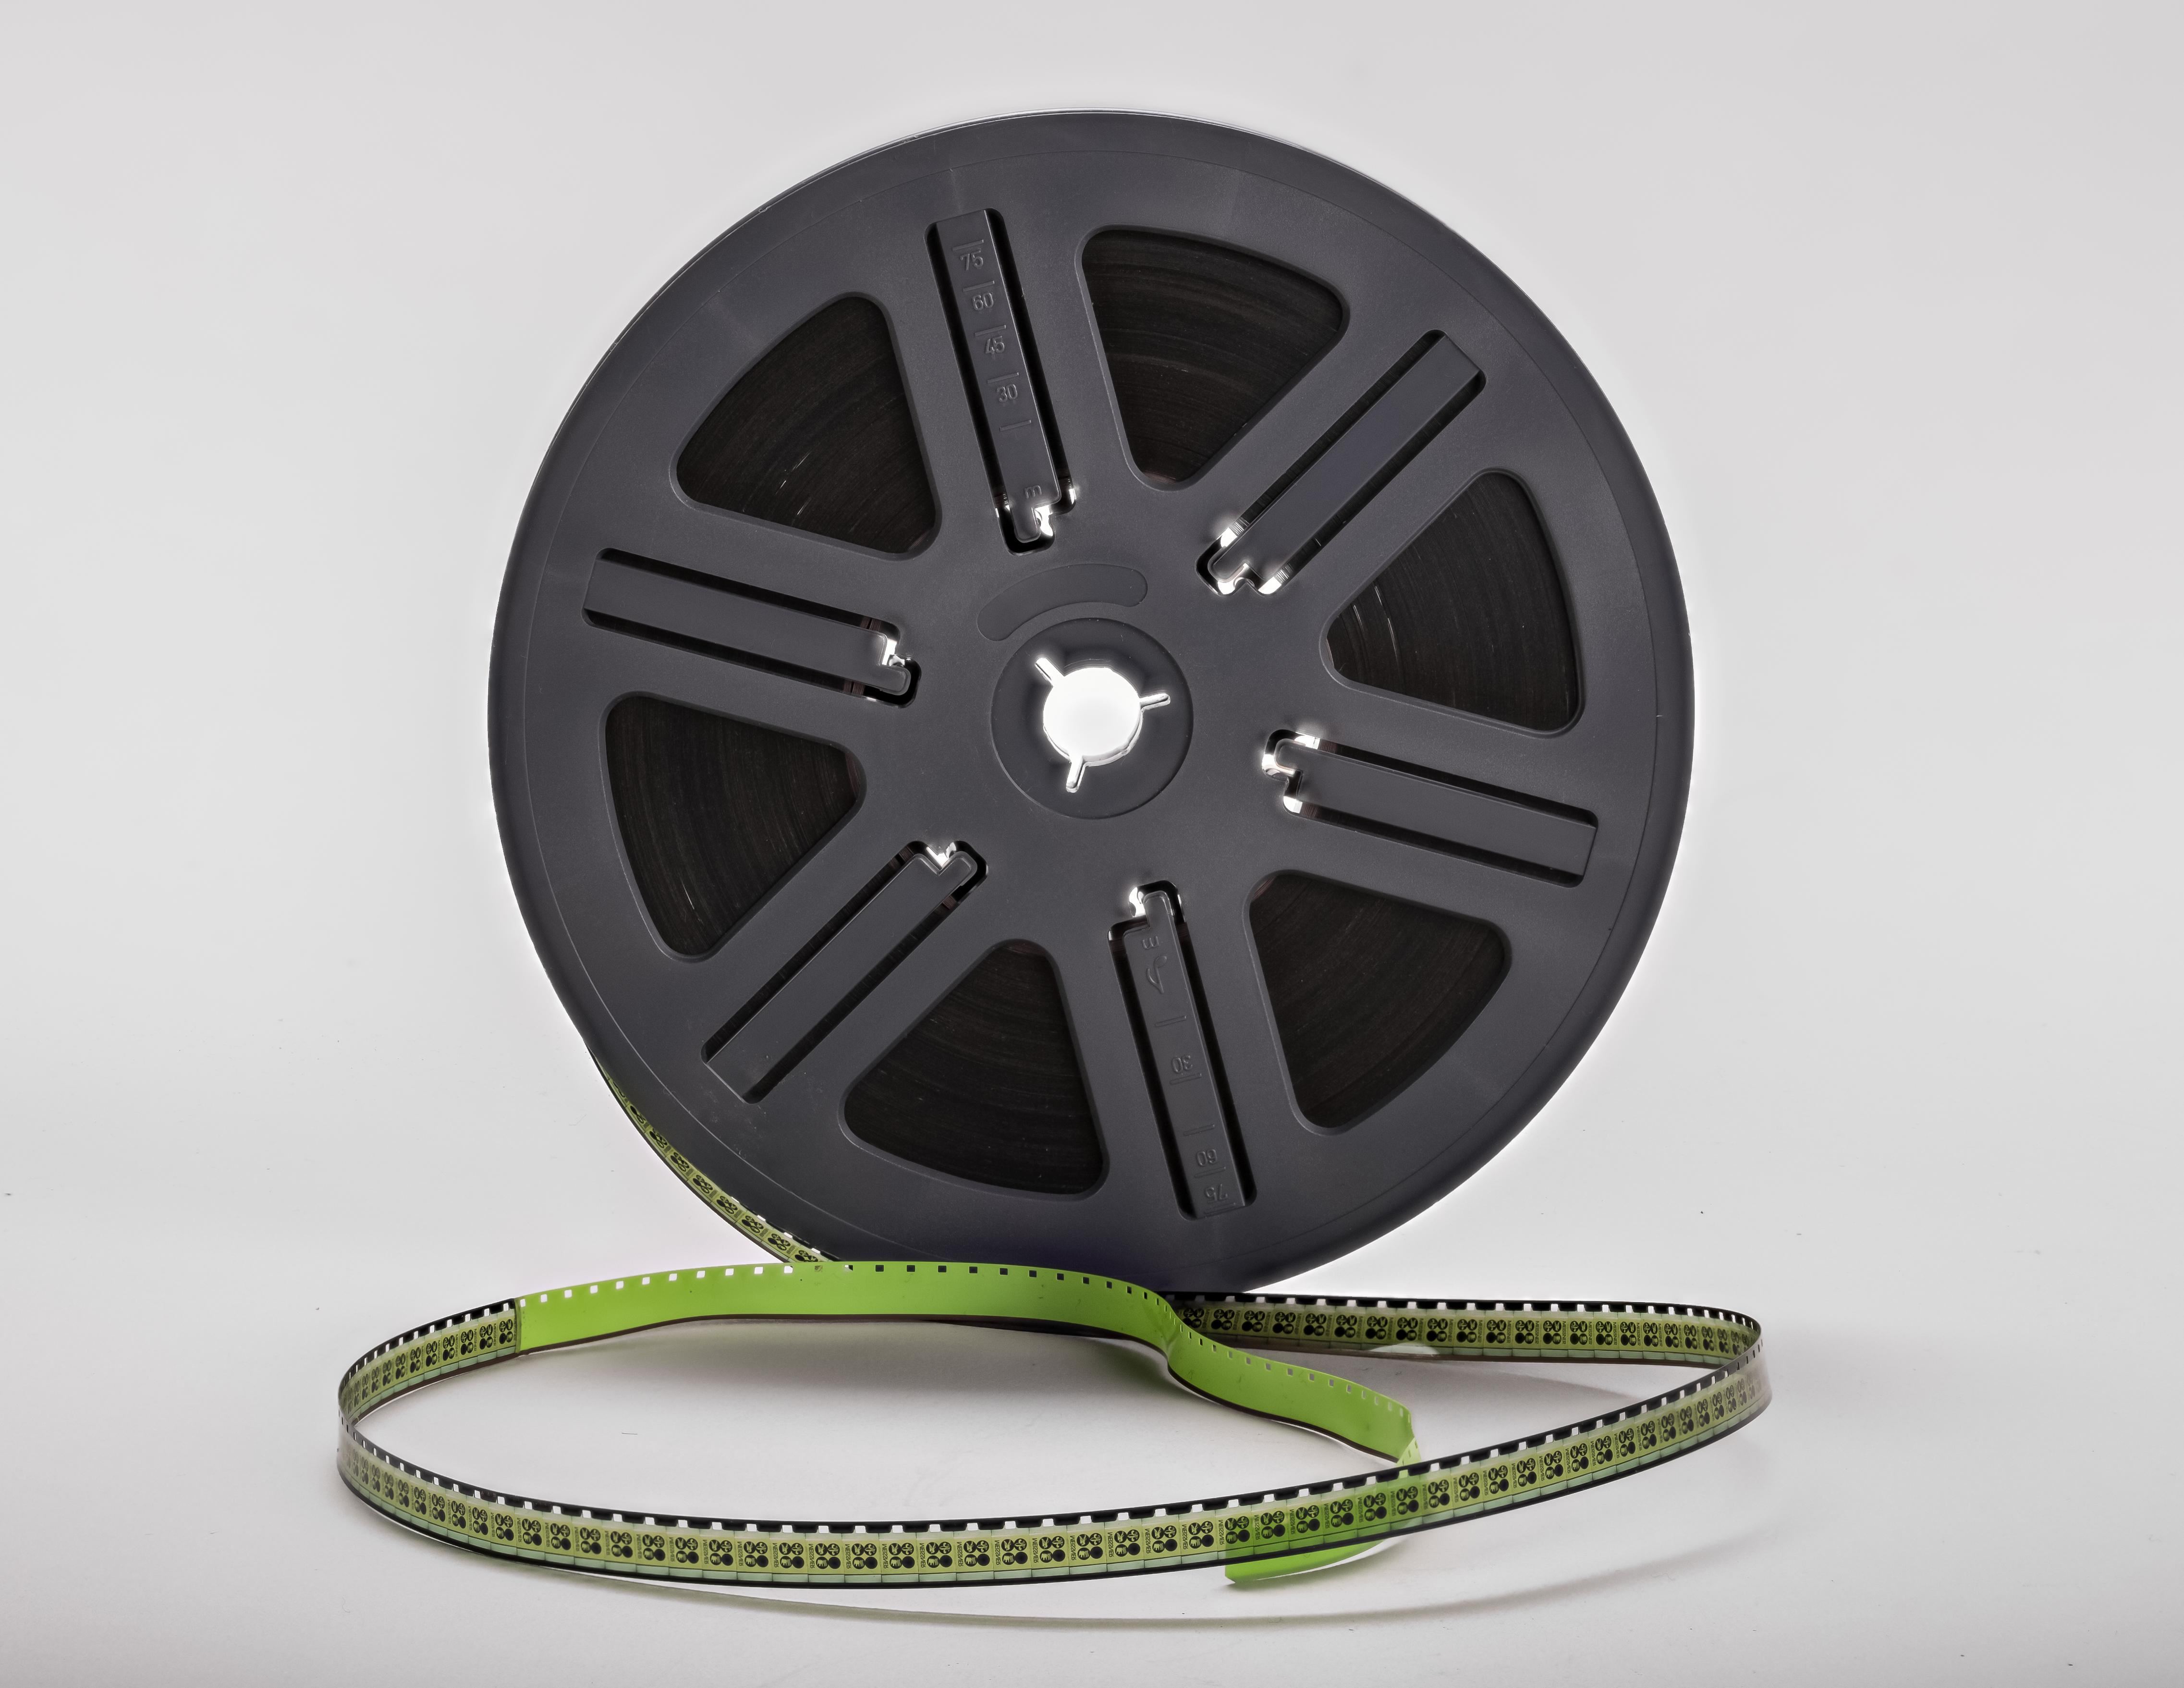 Super-8-mm-film-on-a-spool-01.jpg